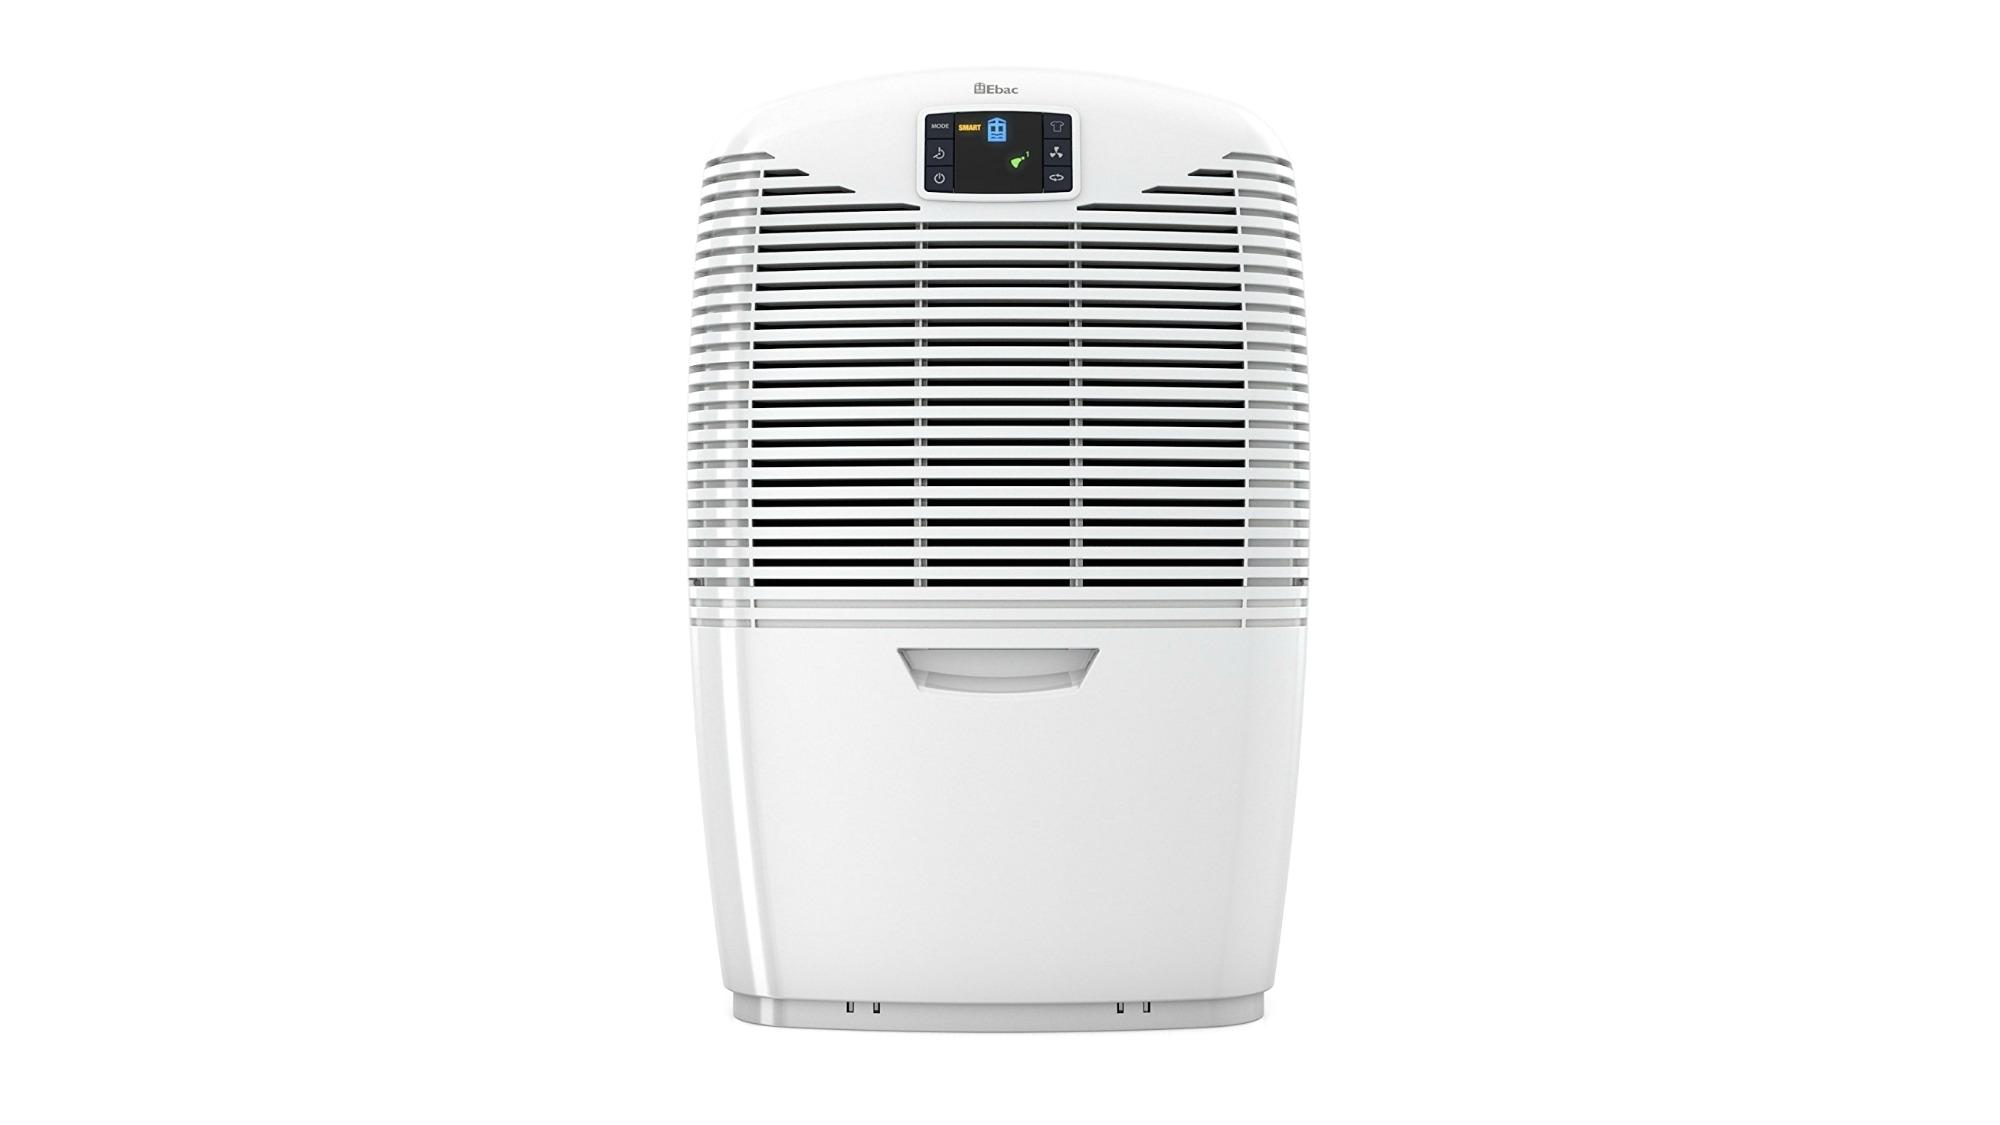 ebac 3650e high performance dehumidifier